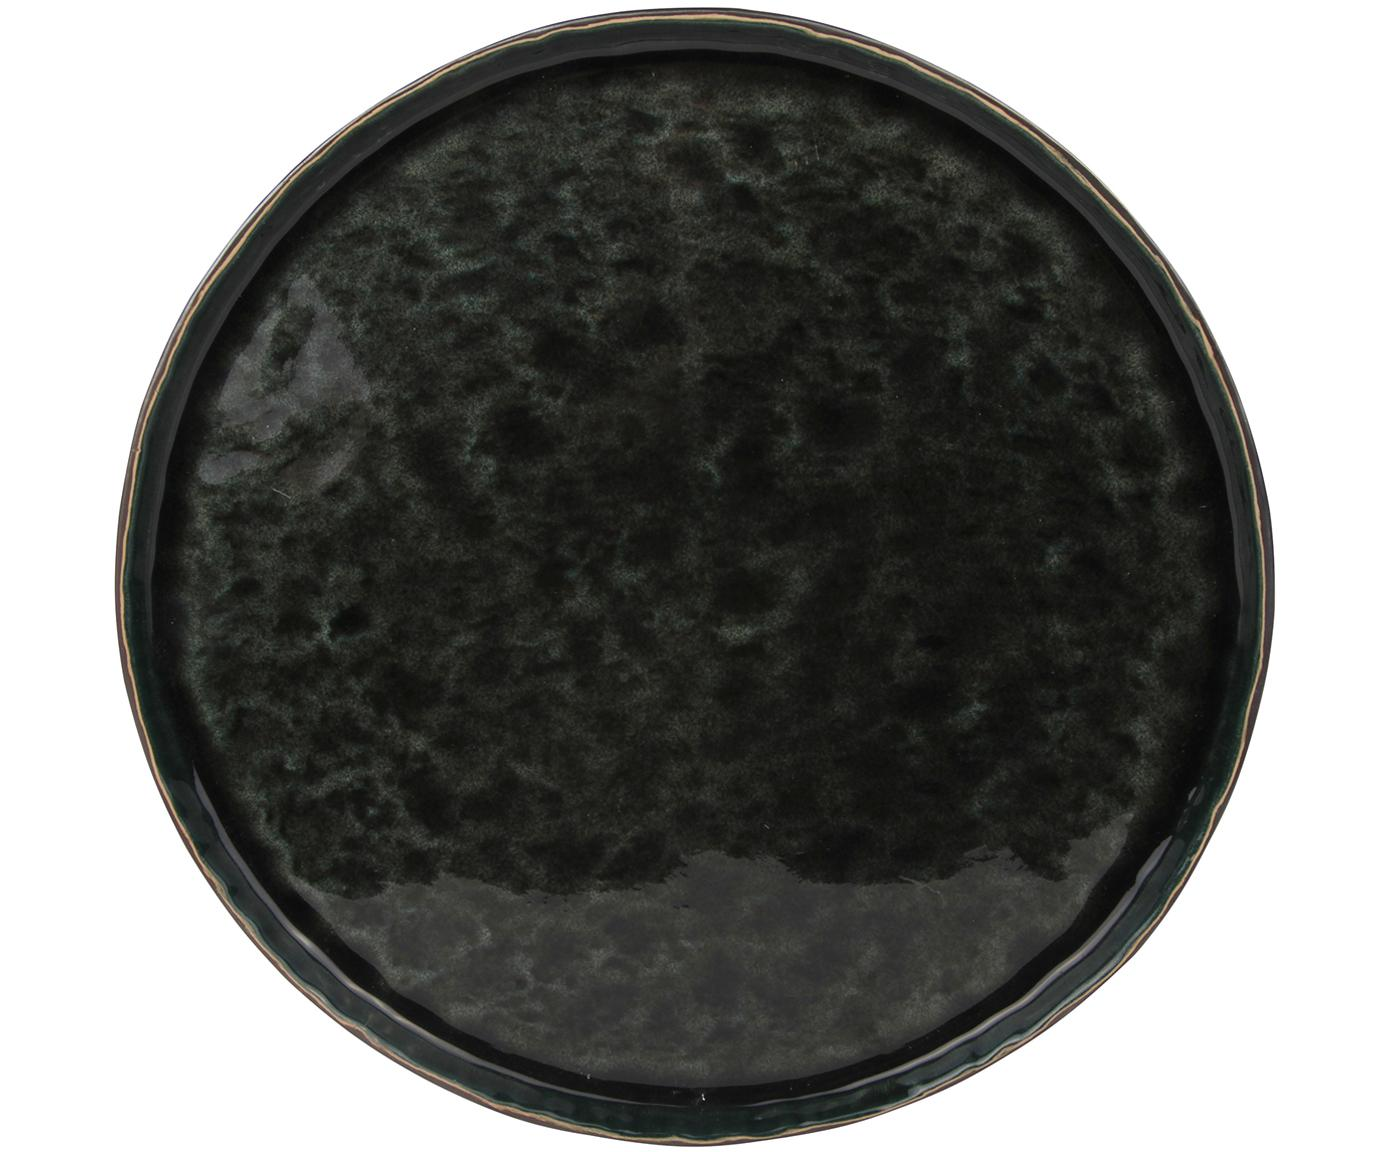 Talerz duży Lagune, 4 szt., Ceramika, Szarobrązowy, czarnoszary, Ø 27 cm